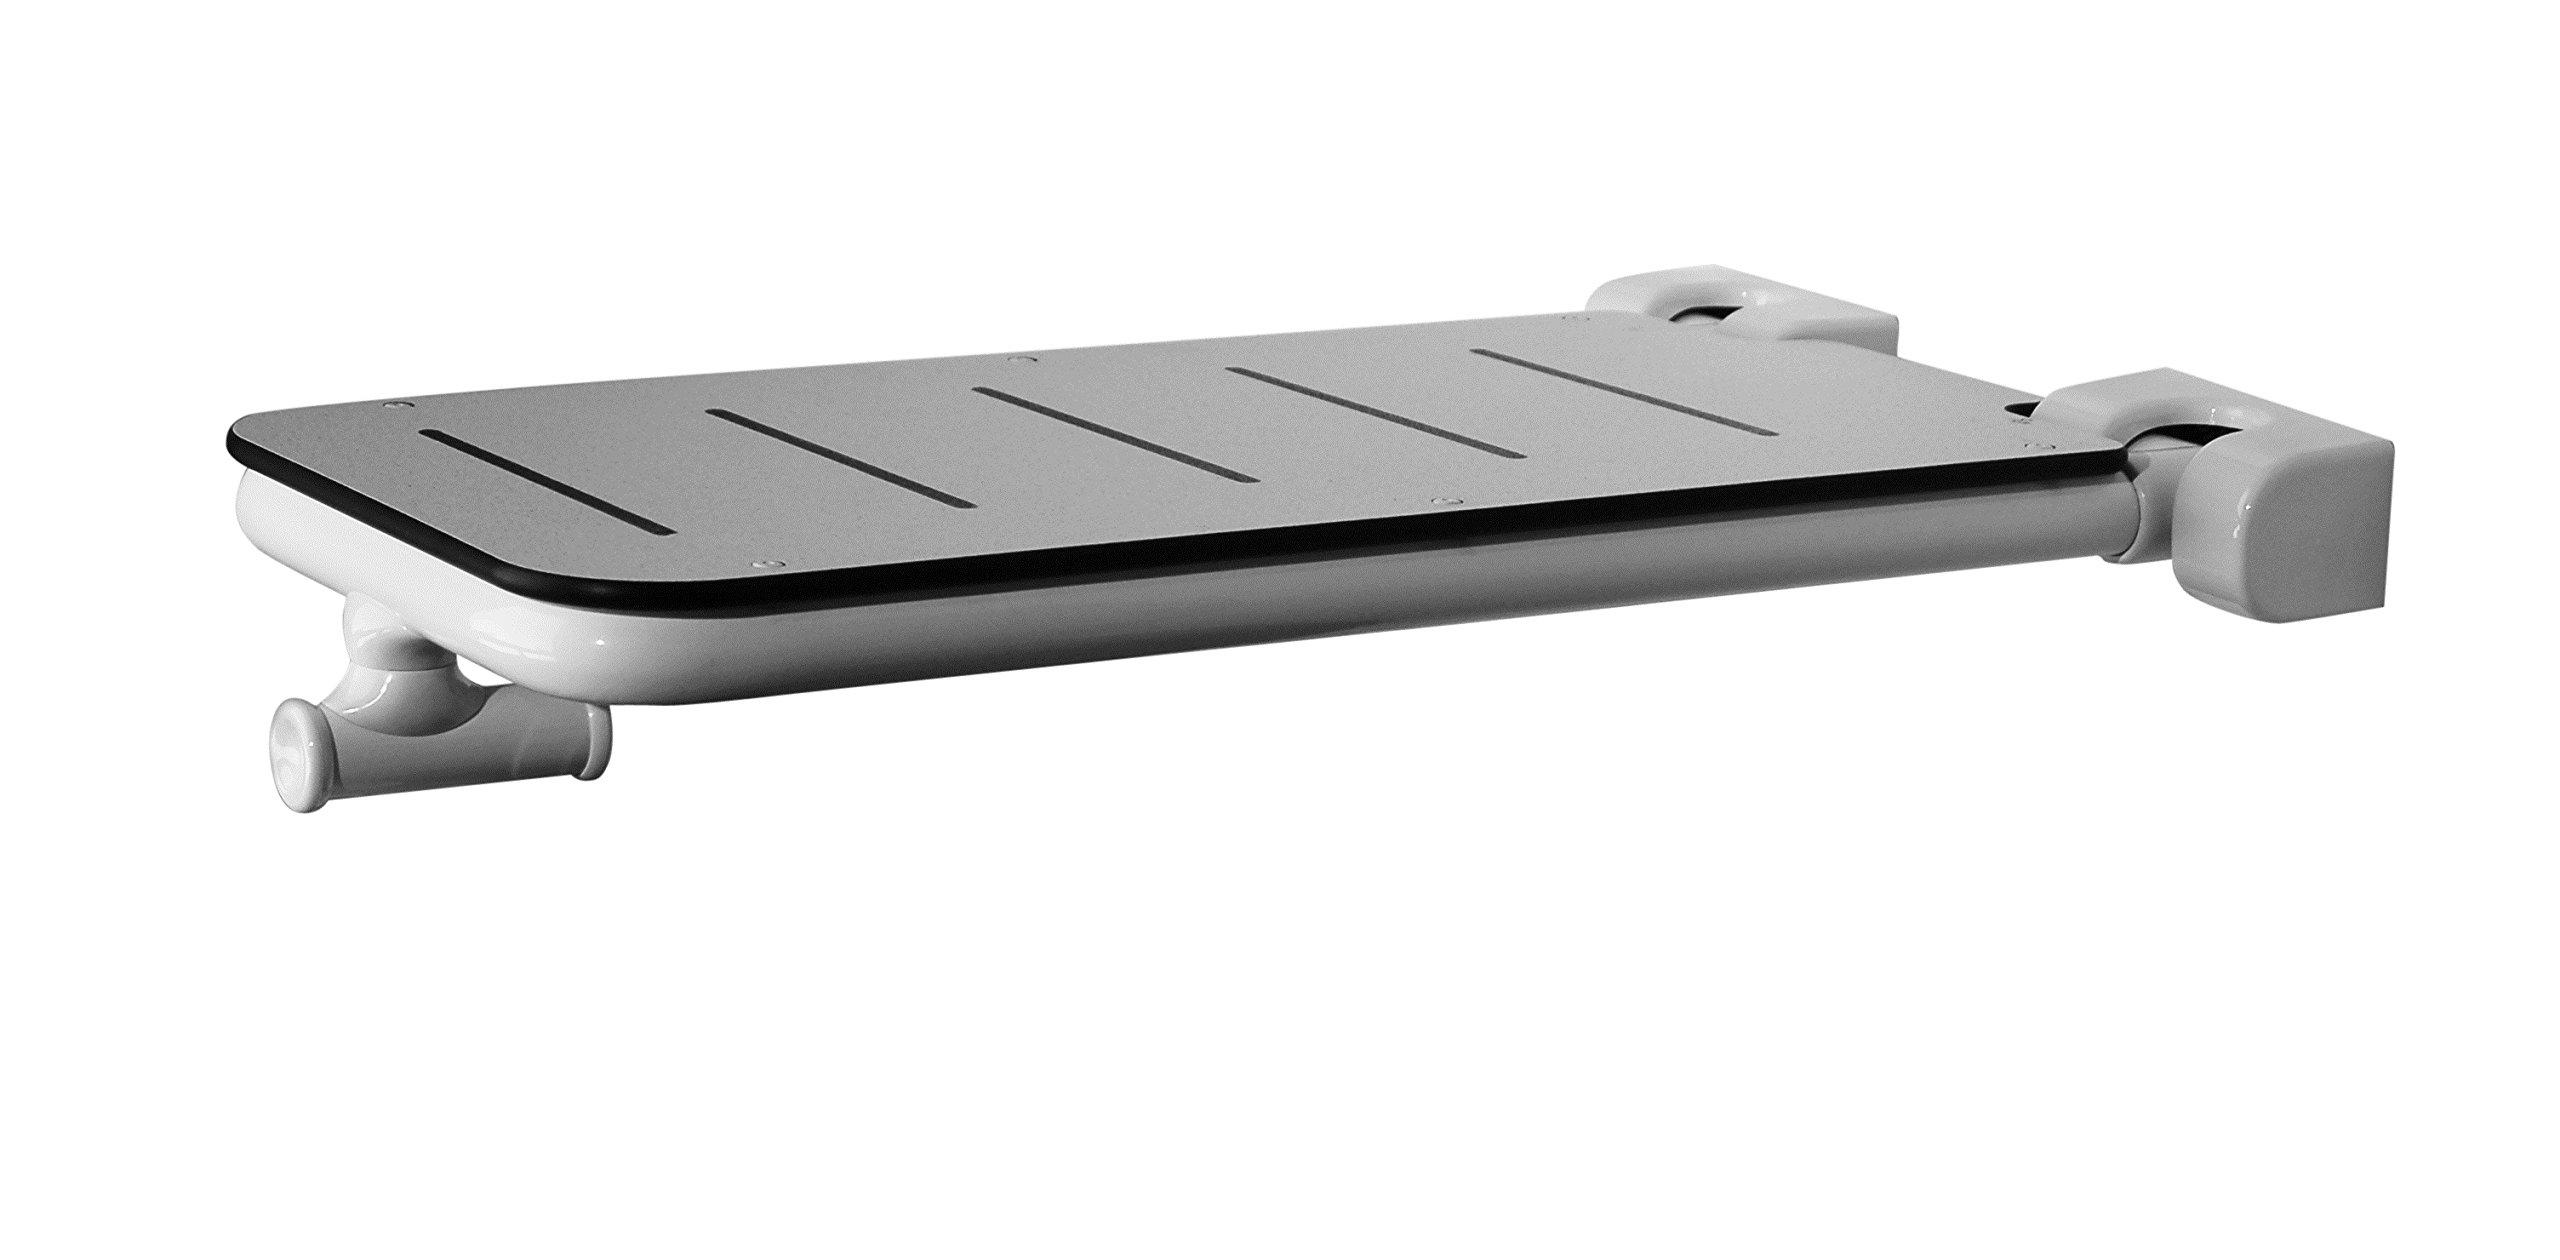 Ponte Giulio Folding Tub Bench (Contractor Series) (White, 18 3/4'' x 31 1/8'' x 5 1/8'')